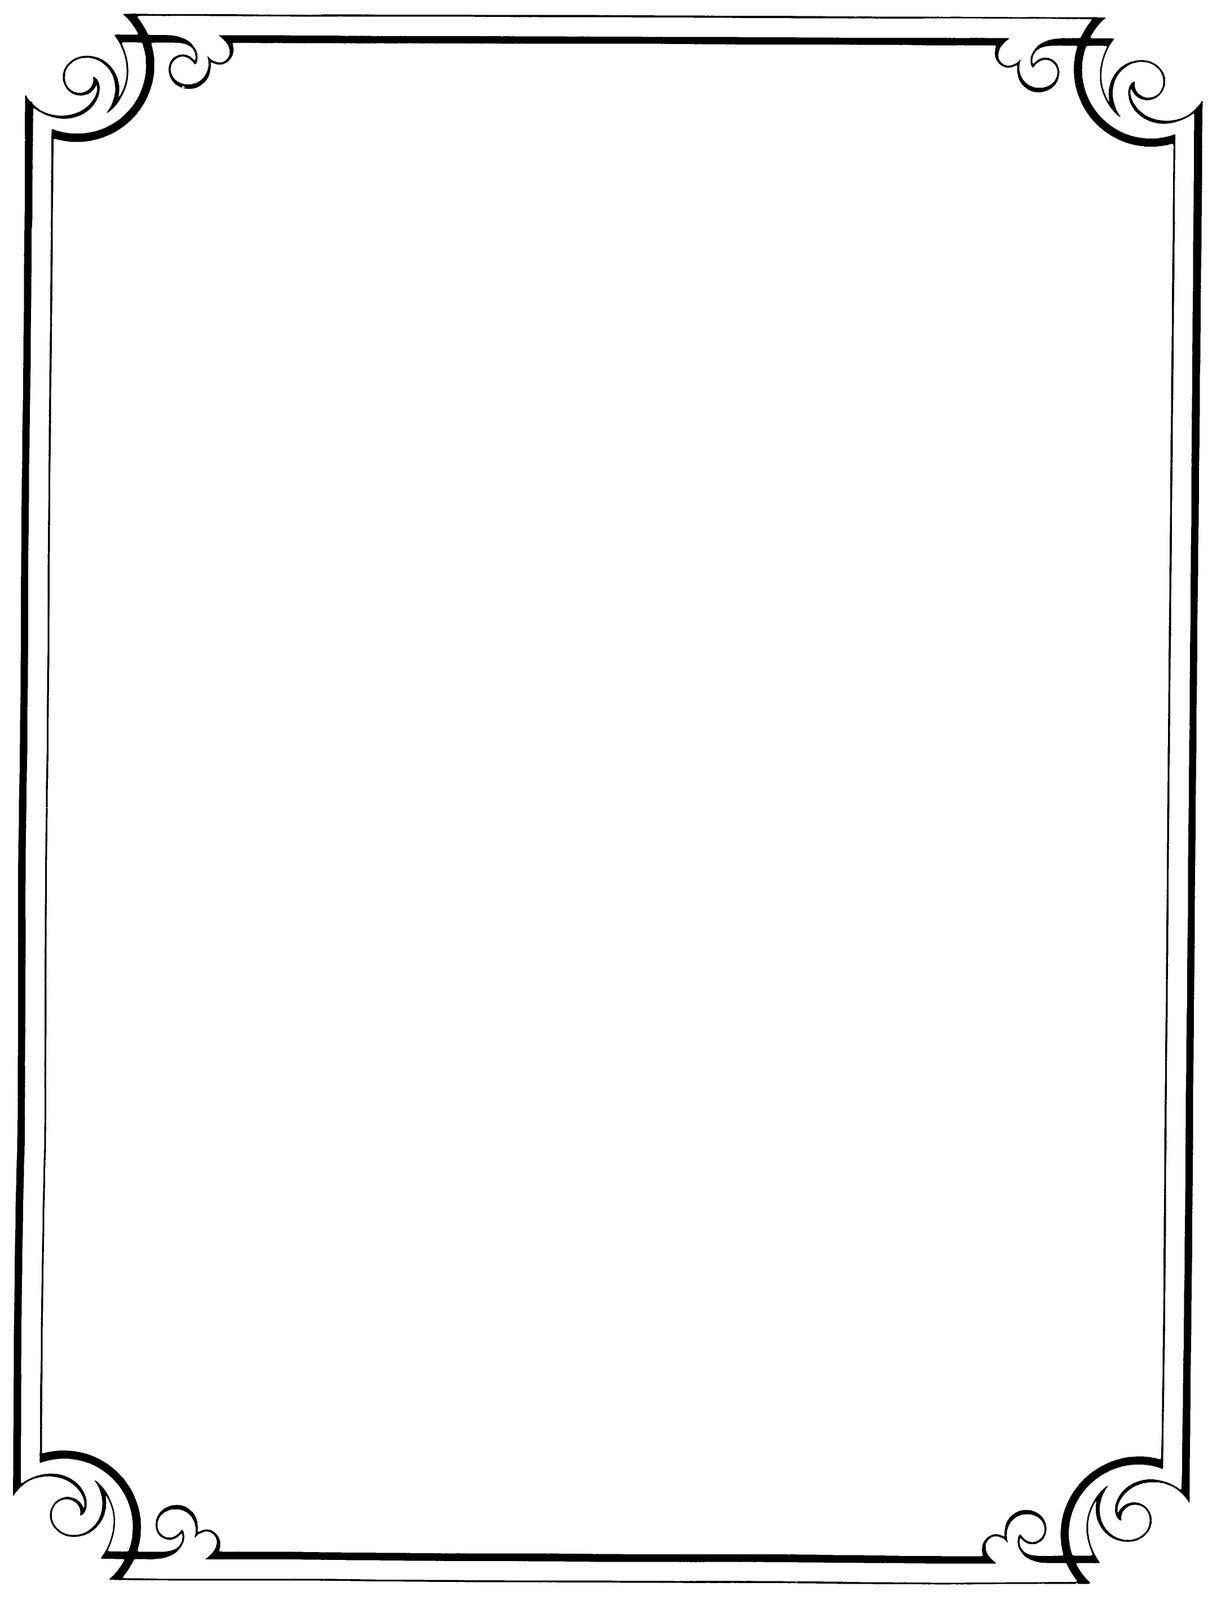 Free Printable Clip Art Borders |  : Free Vintage Clip Art - Free Printable Stationary Borders